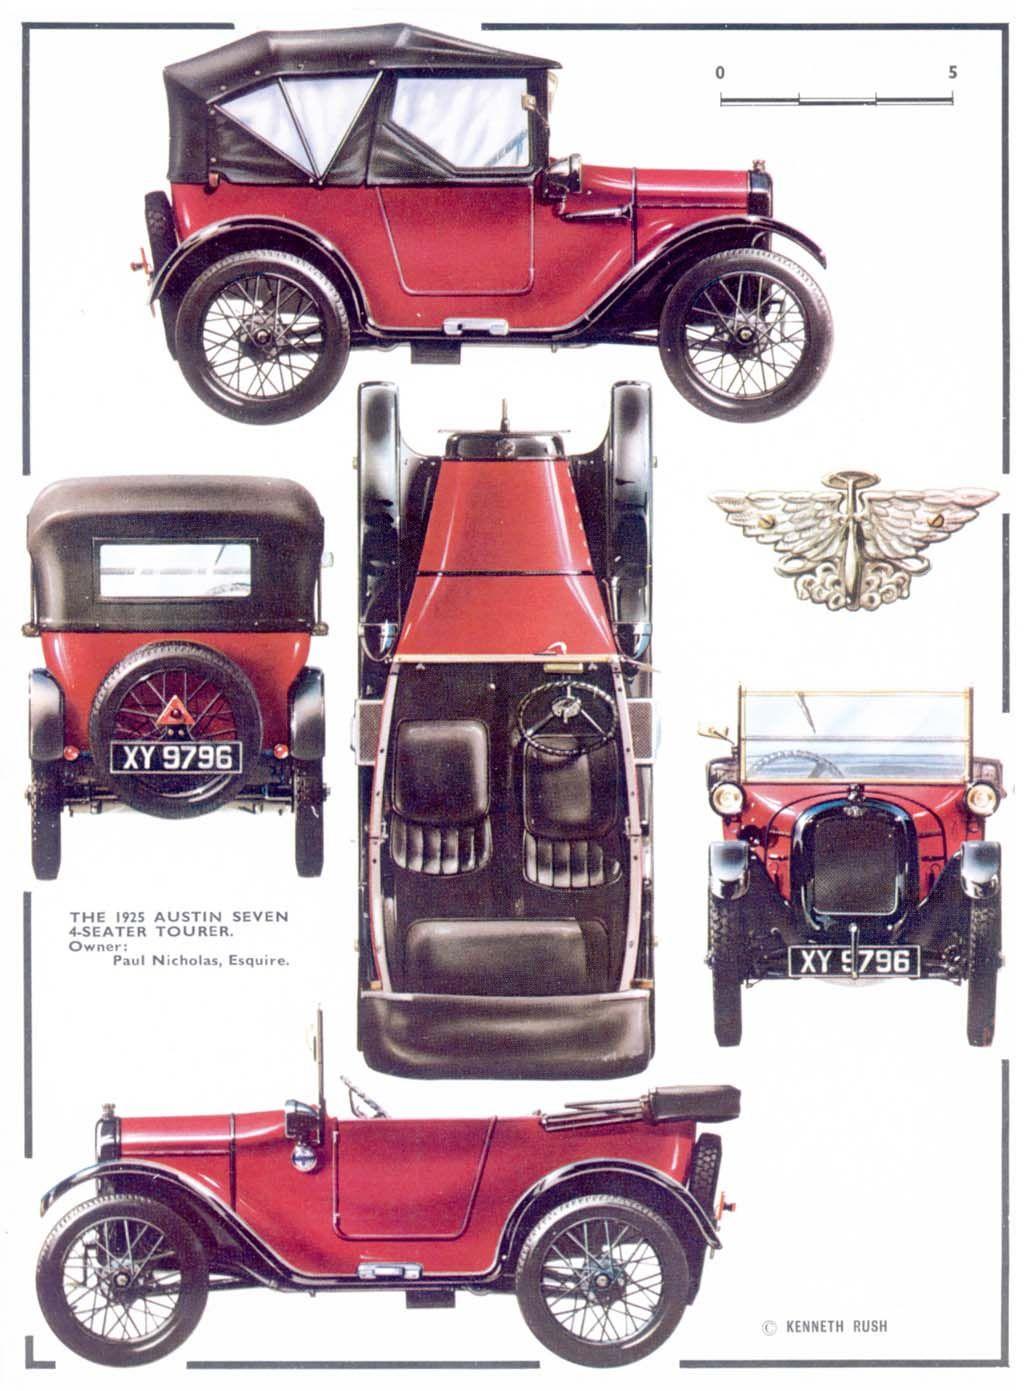 Austin Seven 4-Seater Tourer,